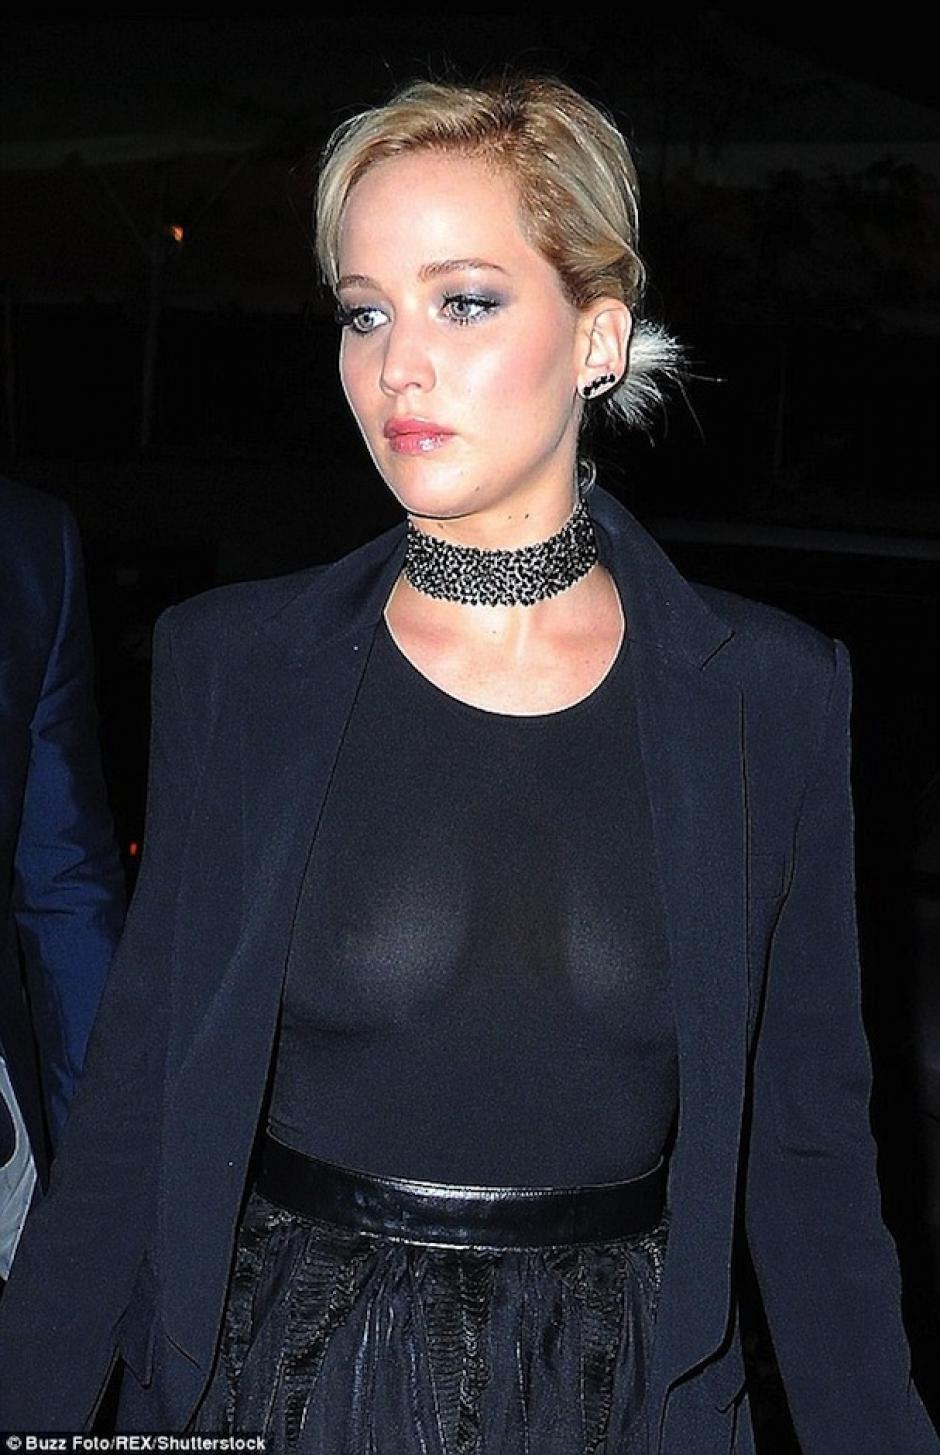 Las cámaras revelaron la transparencia de su blusa. (Foto: mail Online)